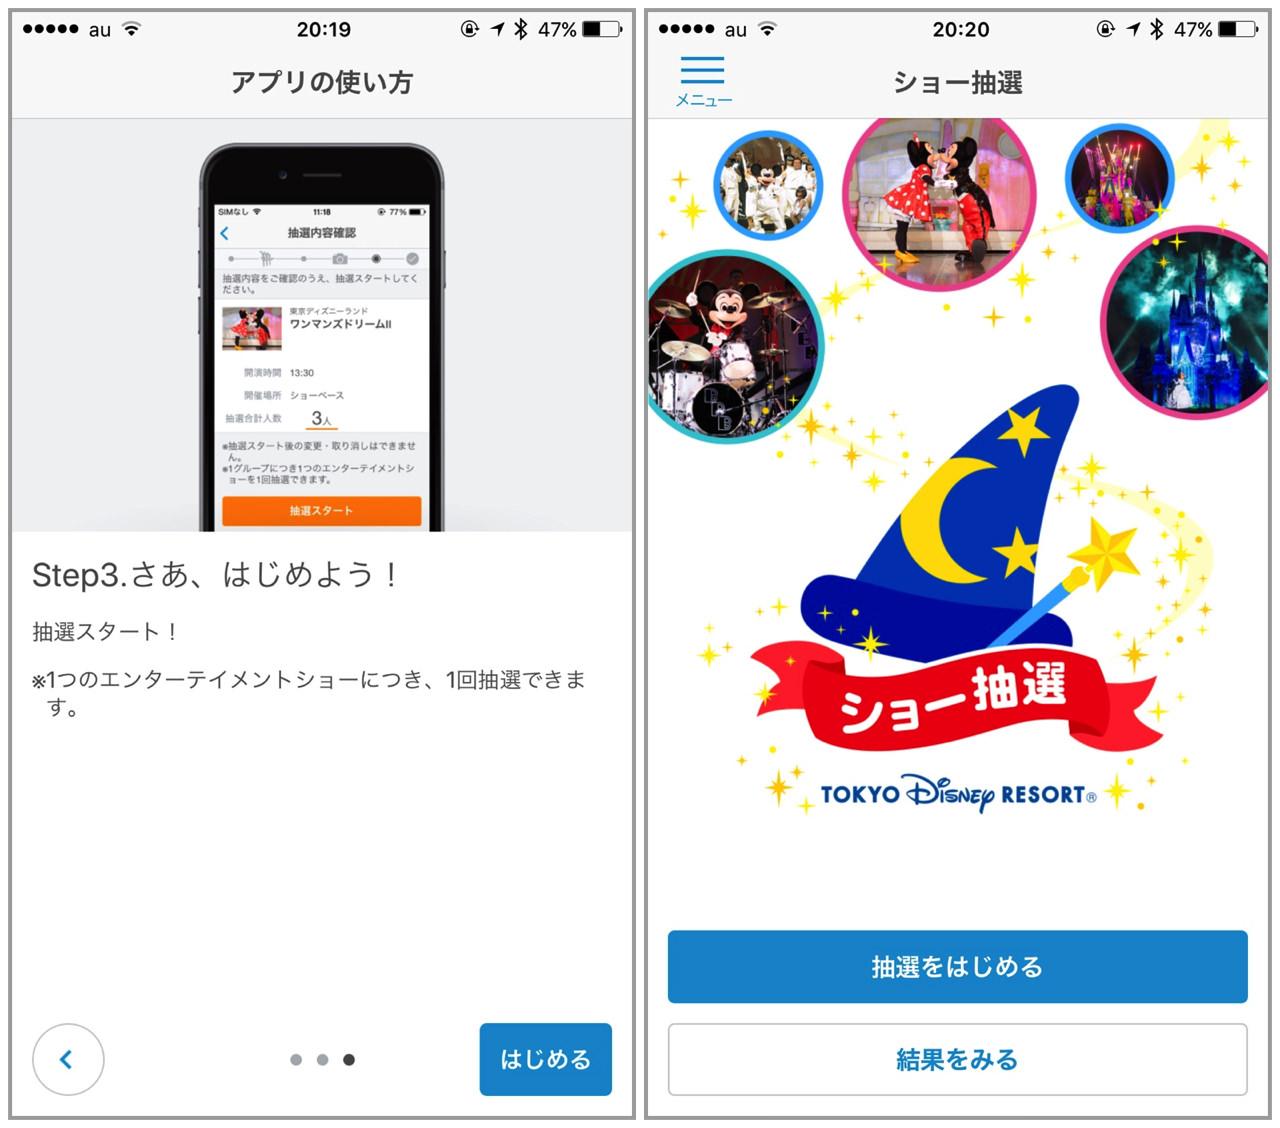 Tokyo disney resort official show lottery app1